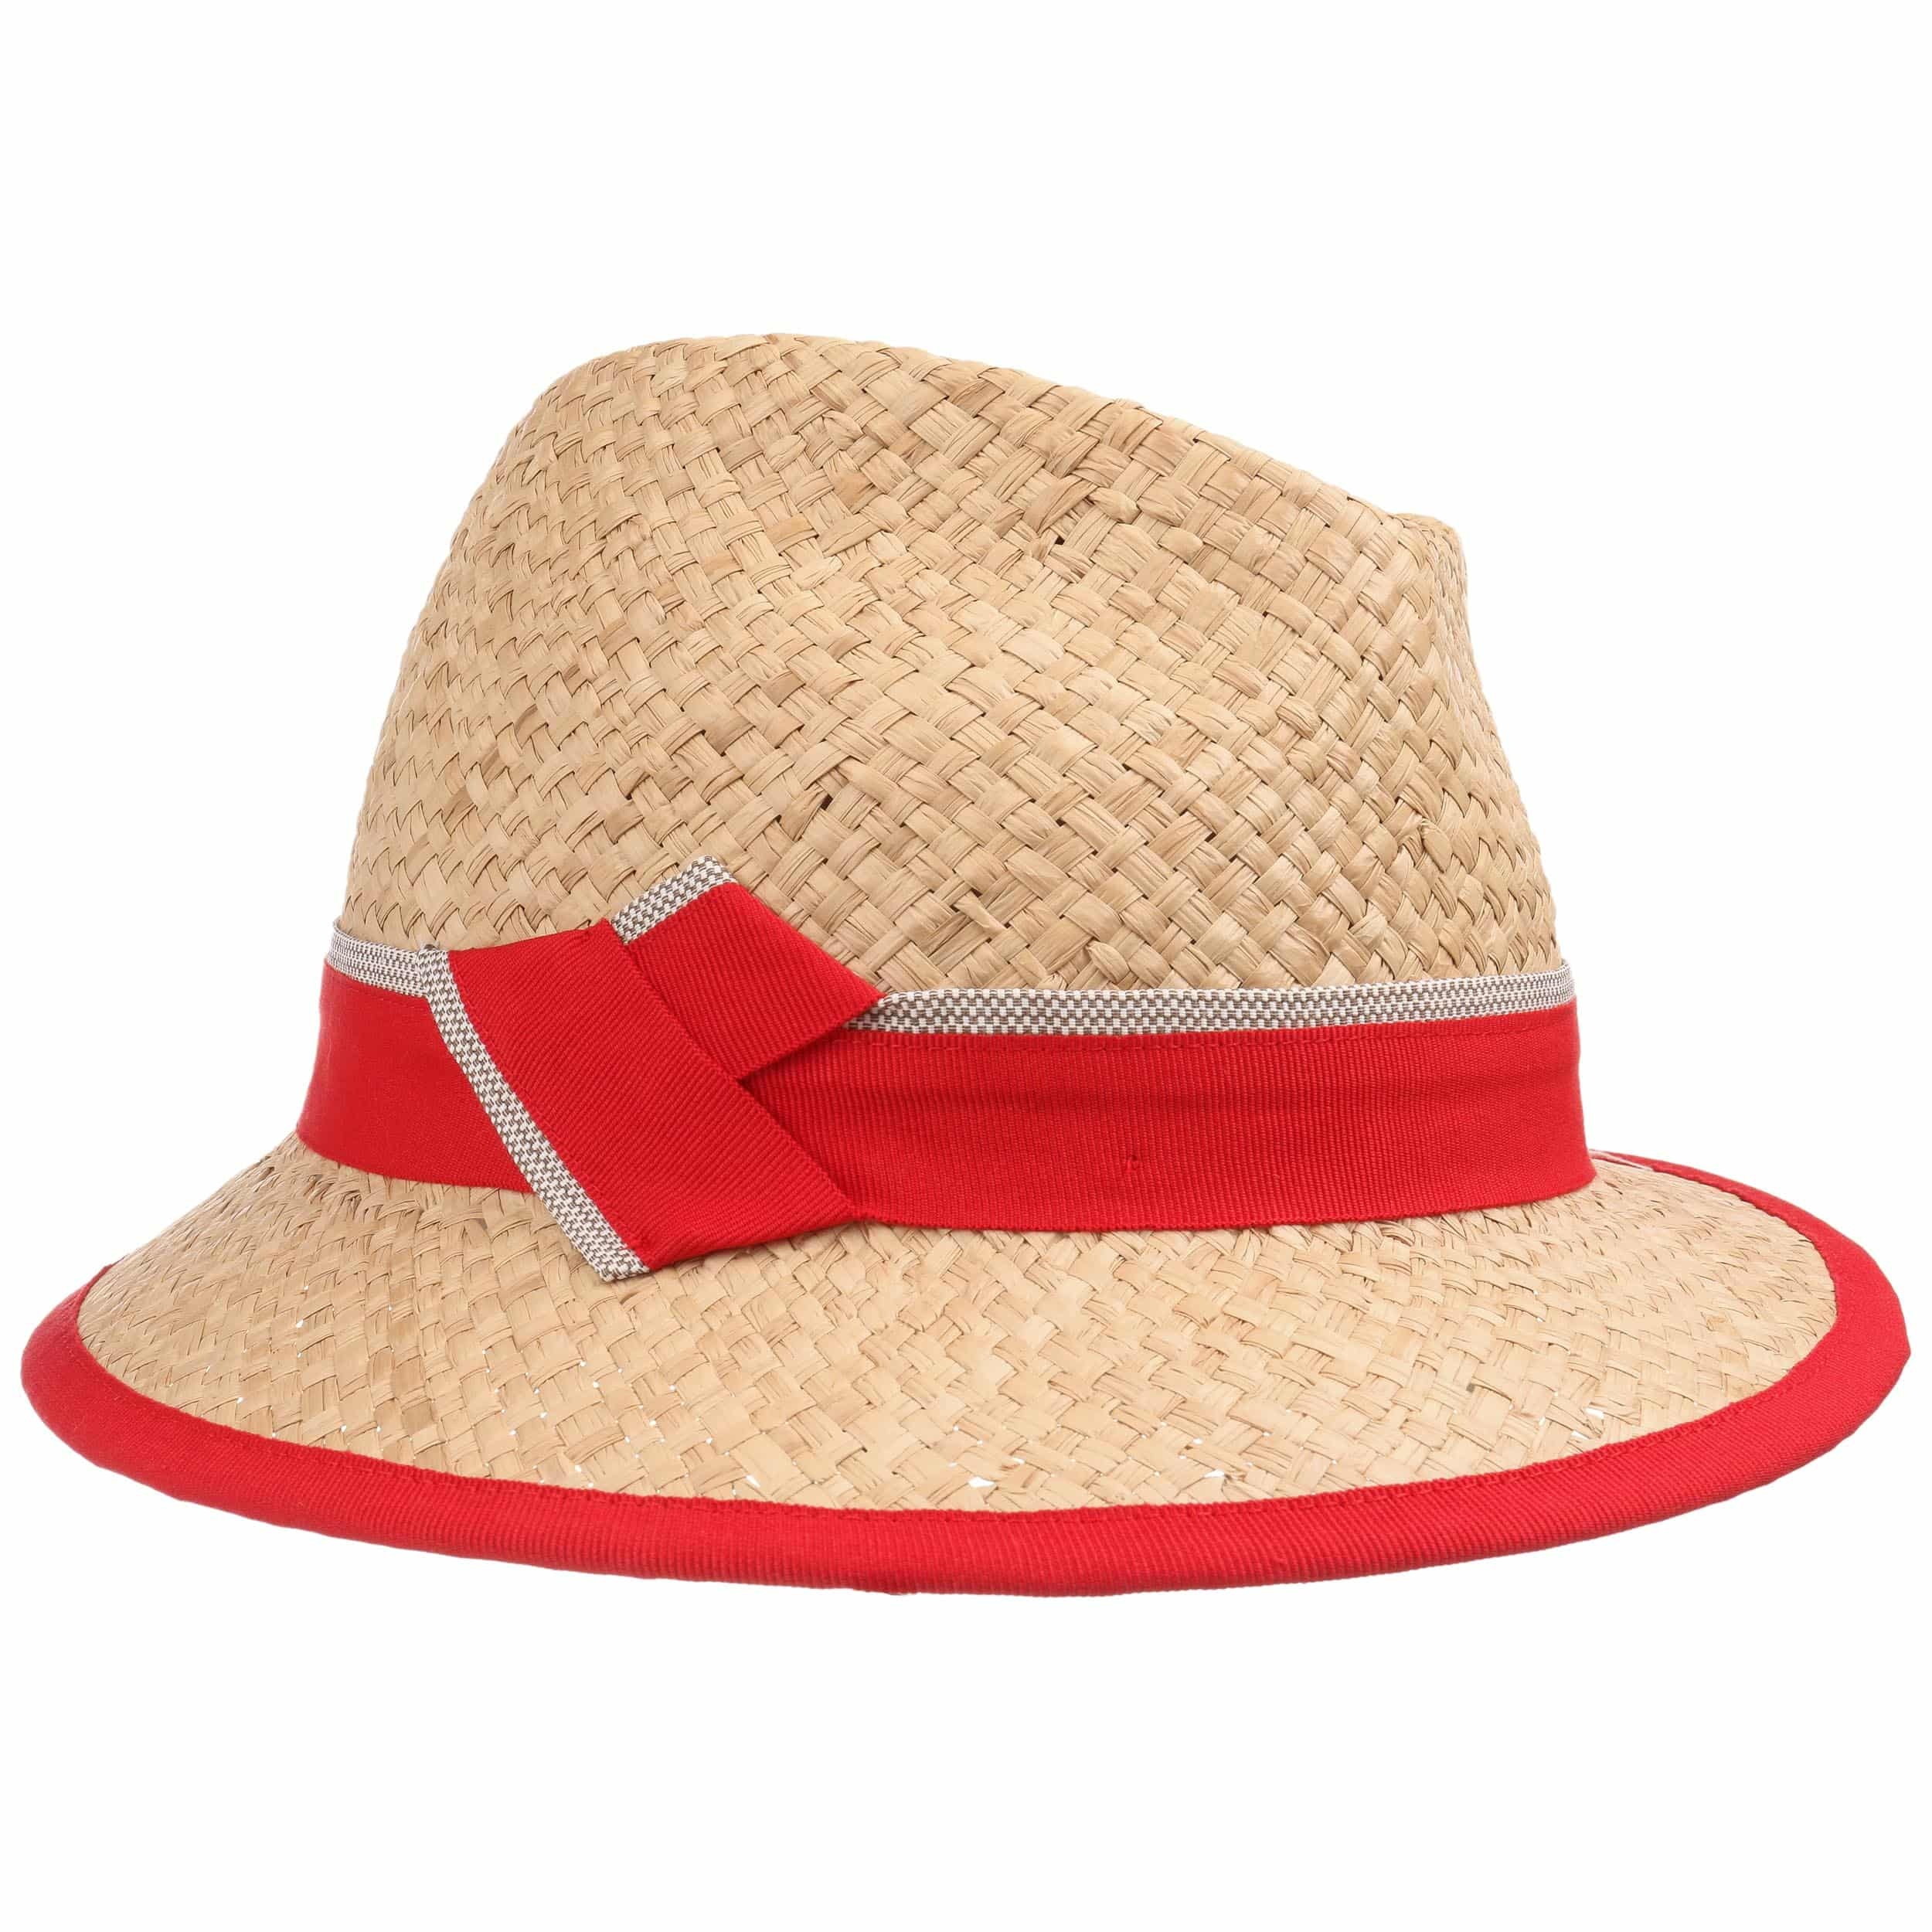 Women's hats online shopping